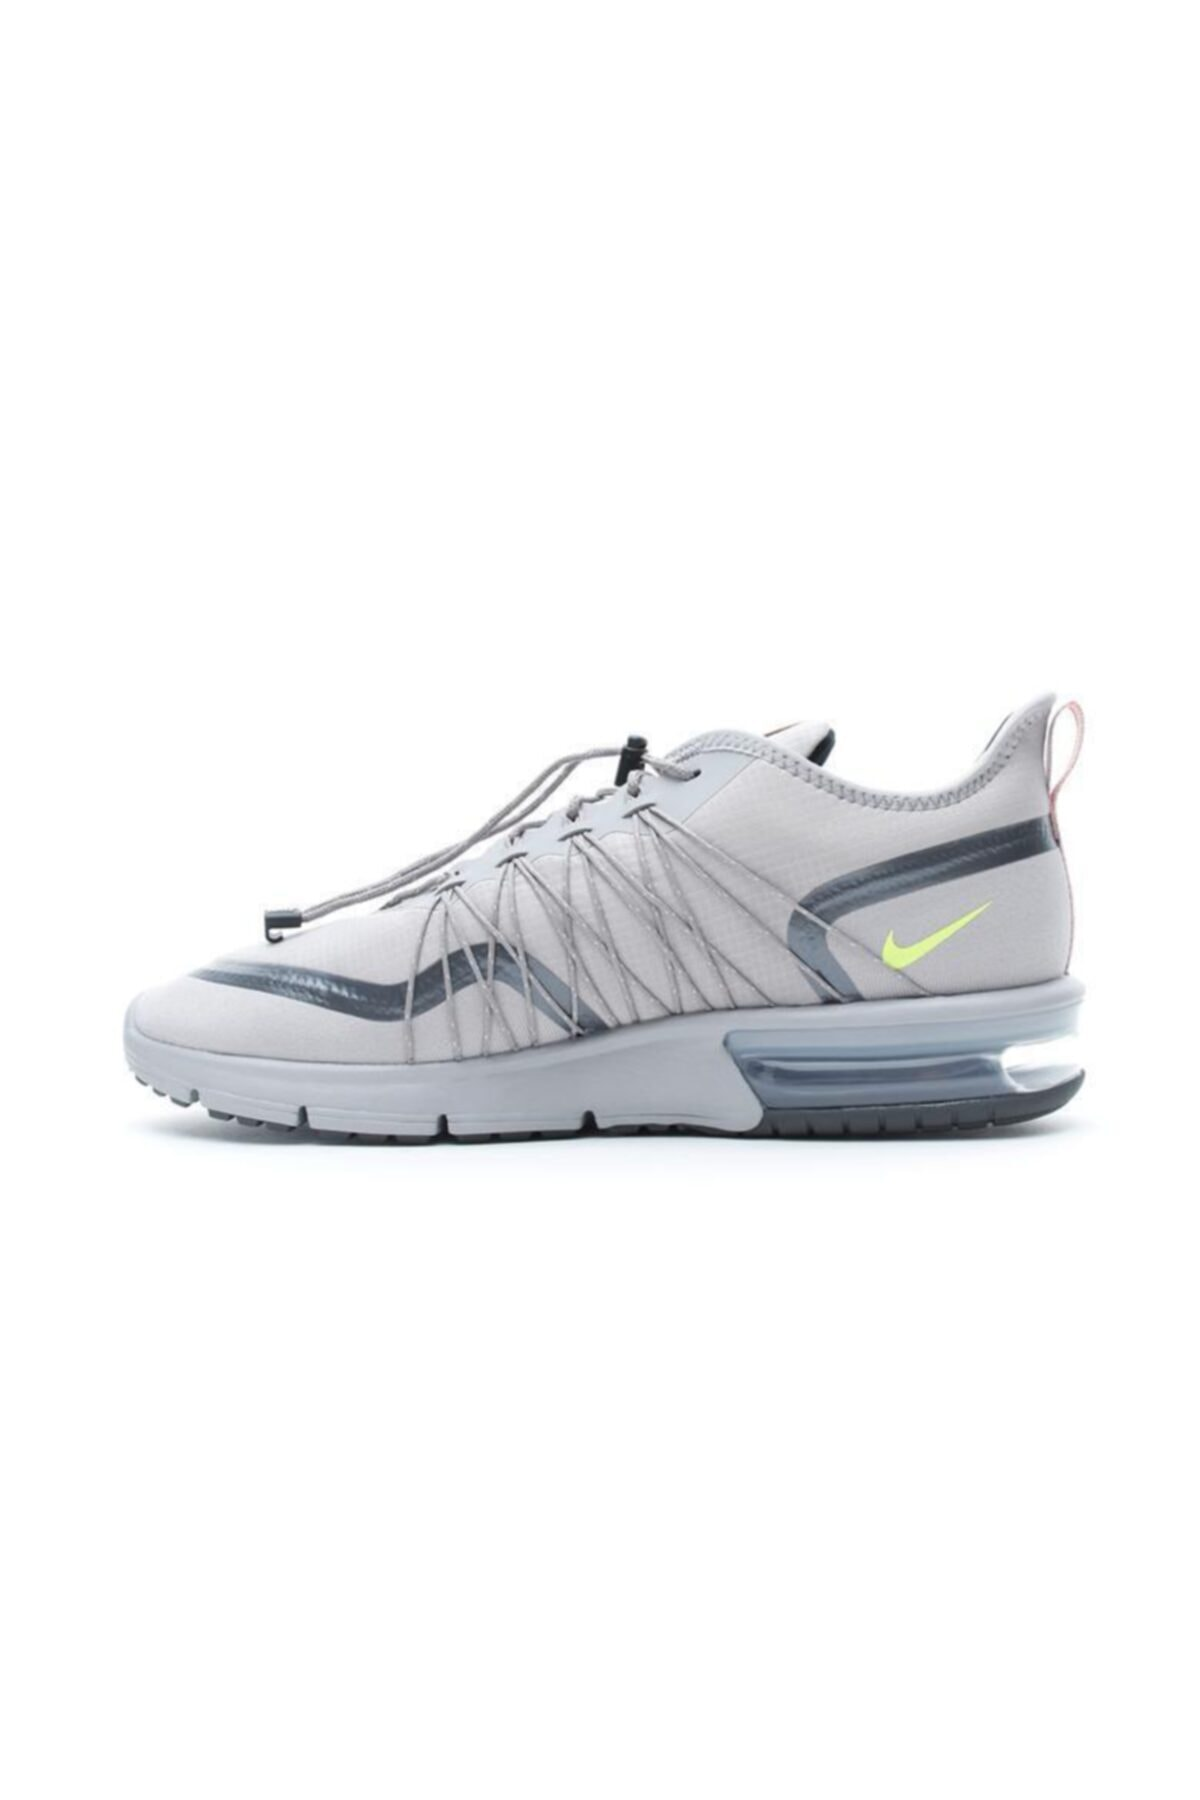 Nike Air Max Sequent 4 Utility Av3236-006 Erkek Günlük Ayakkabı 2